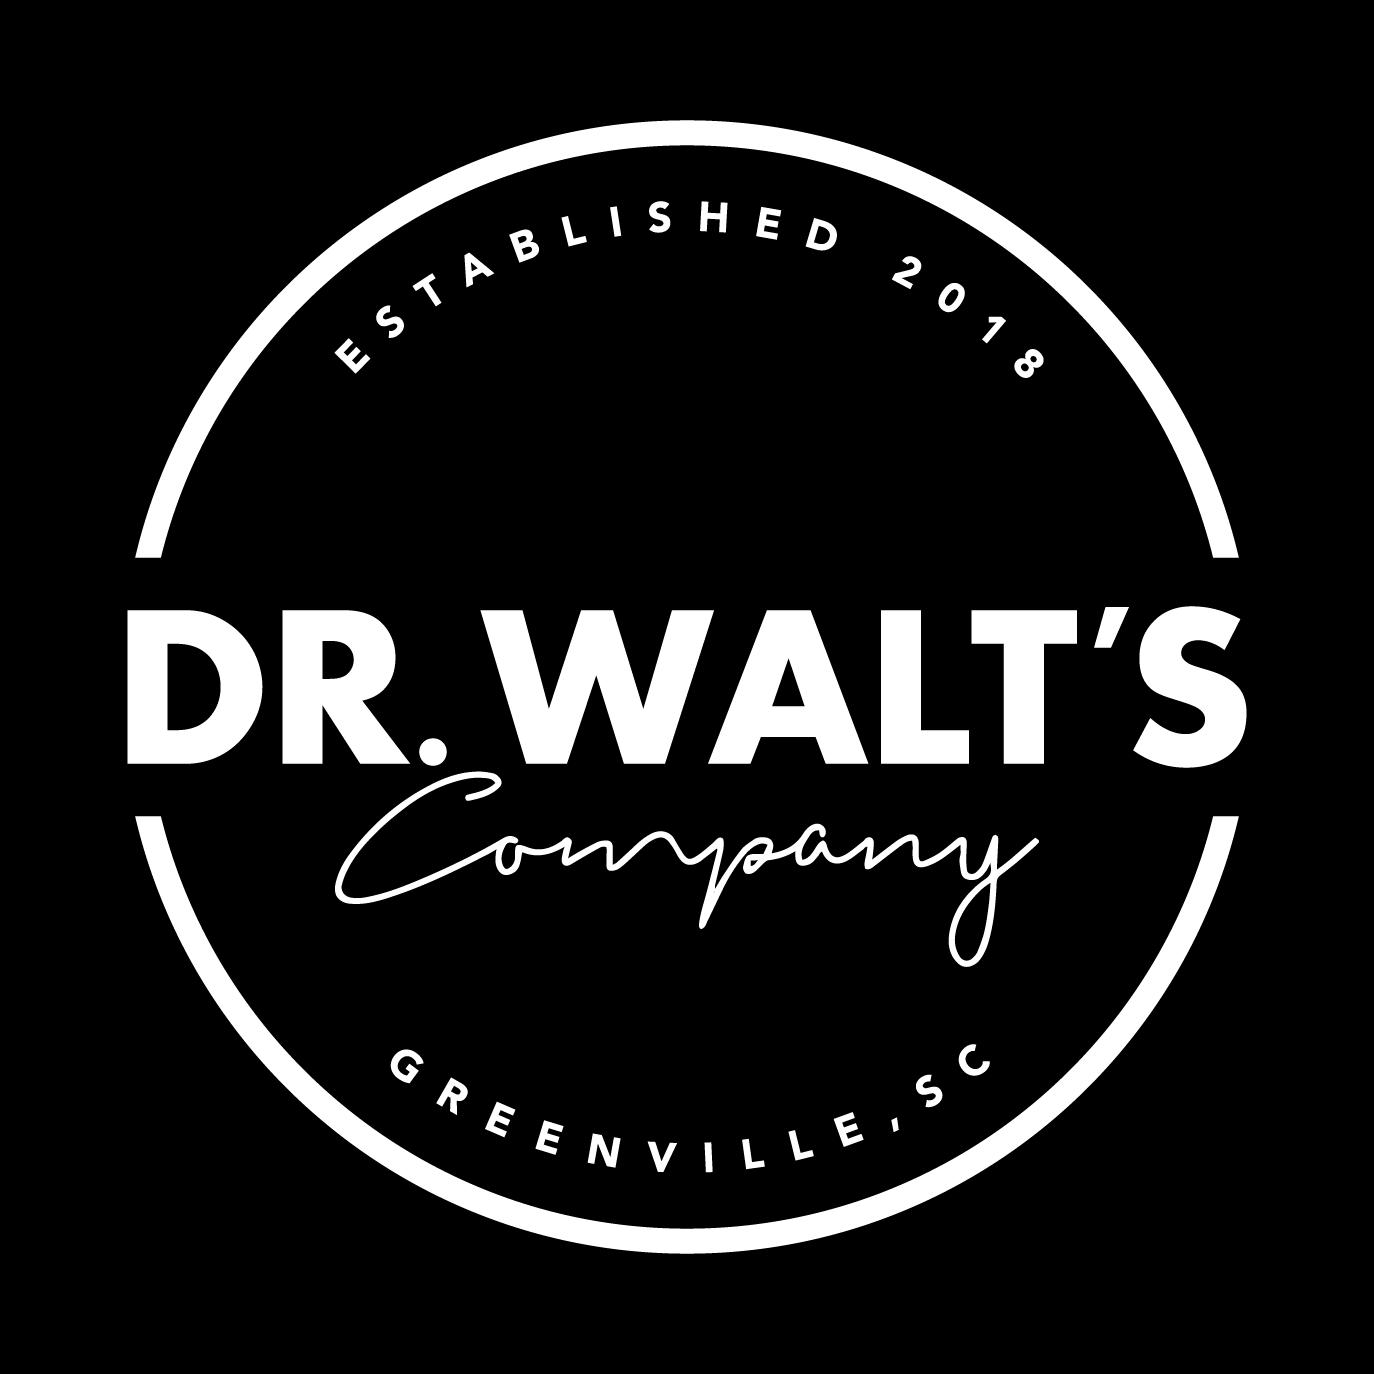 Dr. Walt's Co.